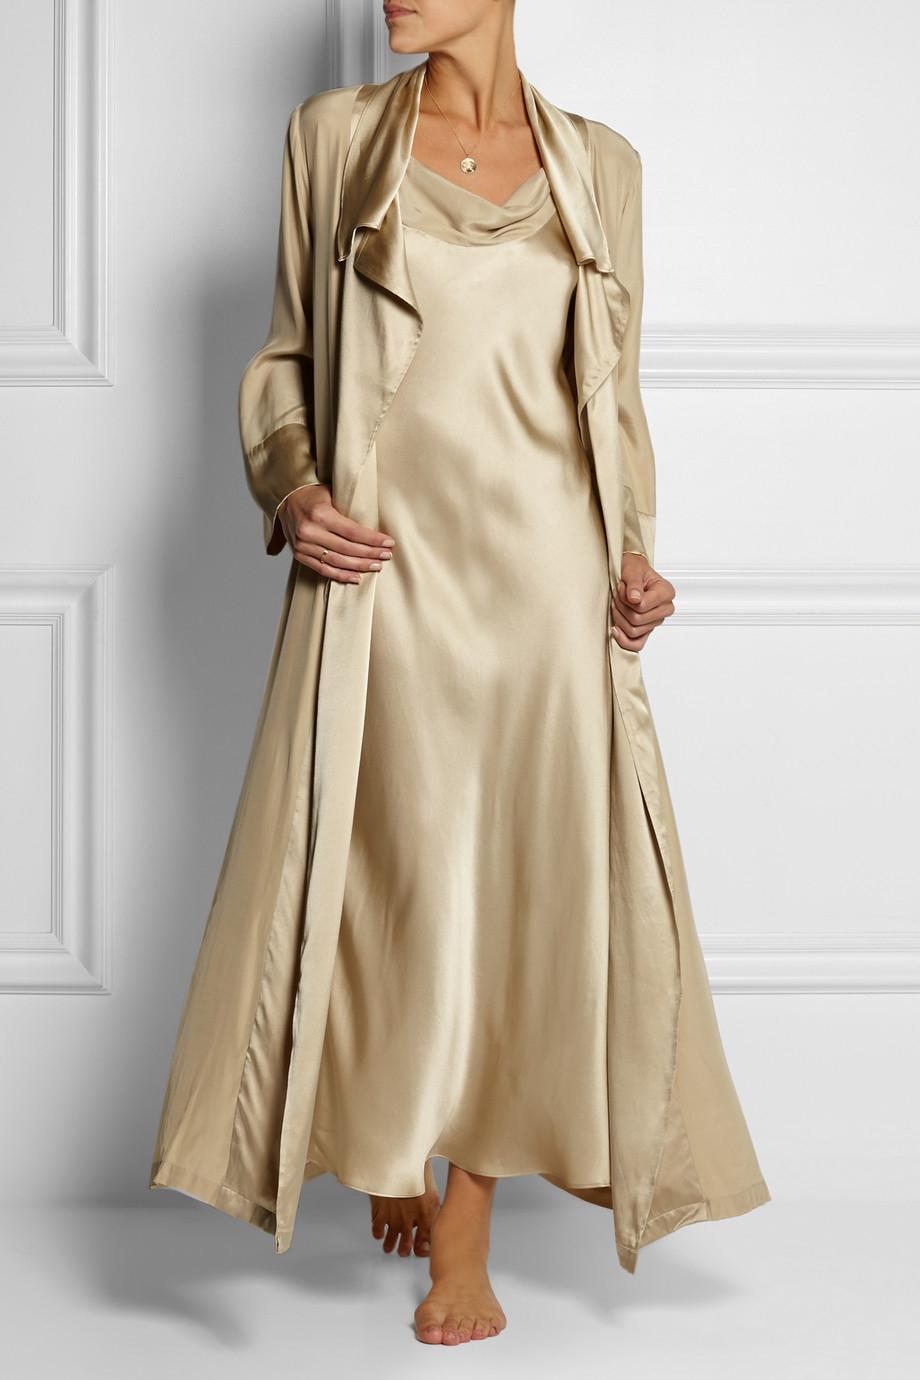 Lyst - Donna Karan Glamour Silk-satin Robe in Metallic 53481705c